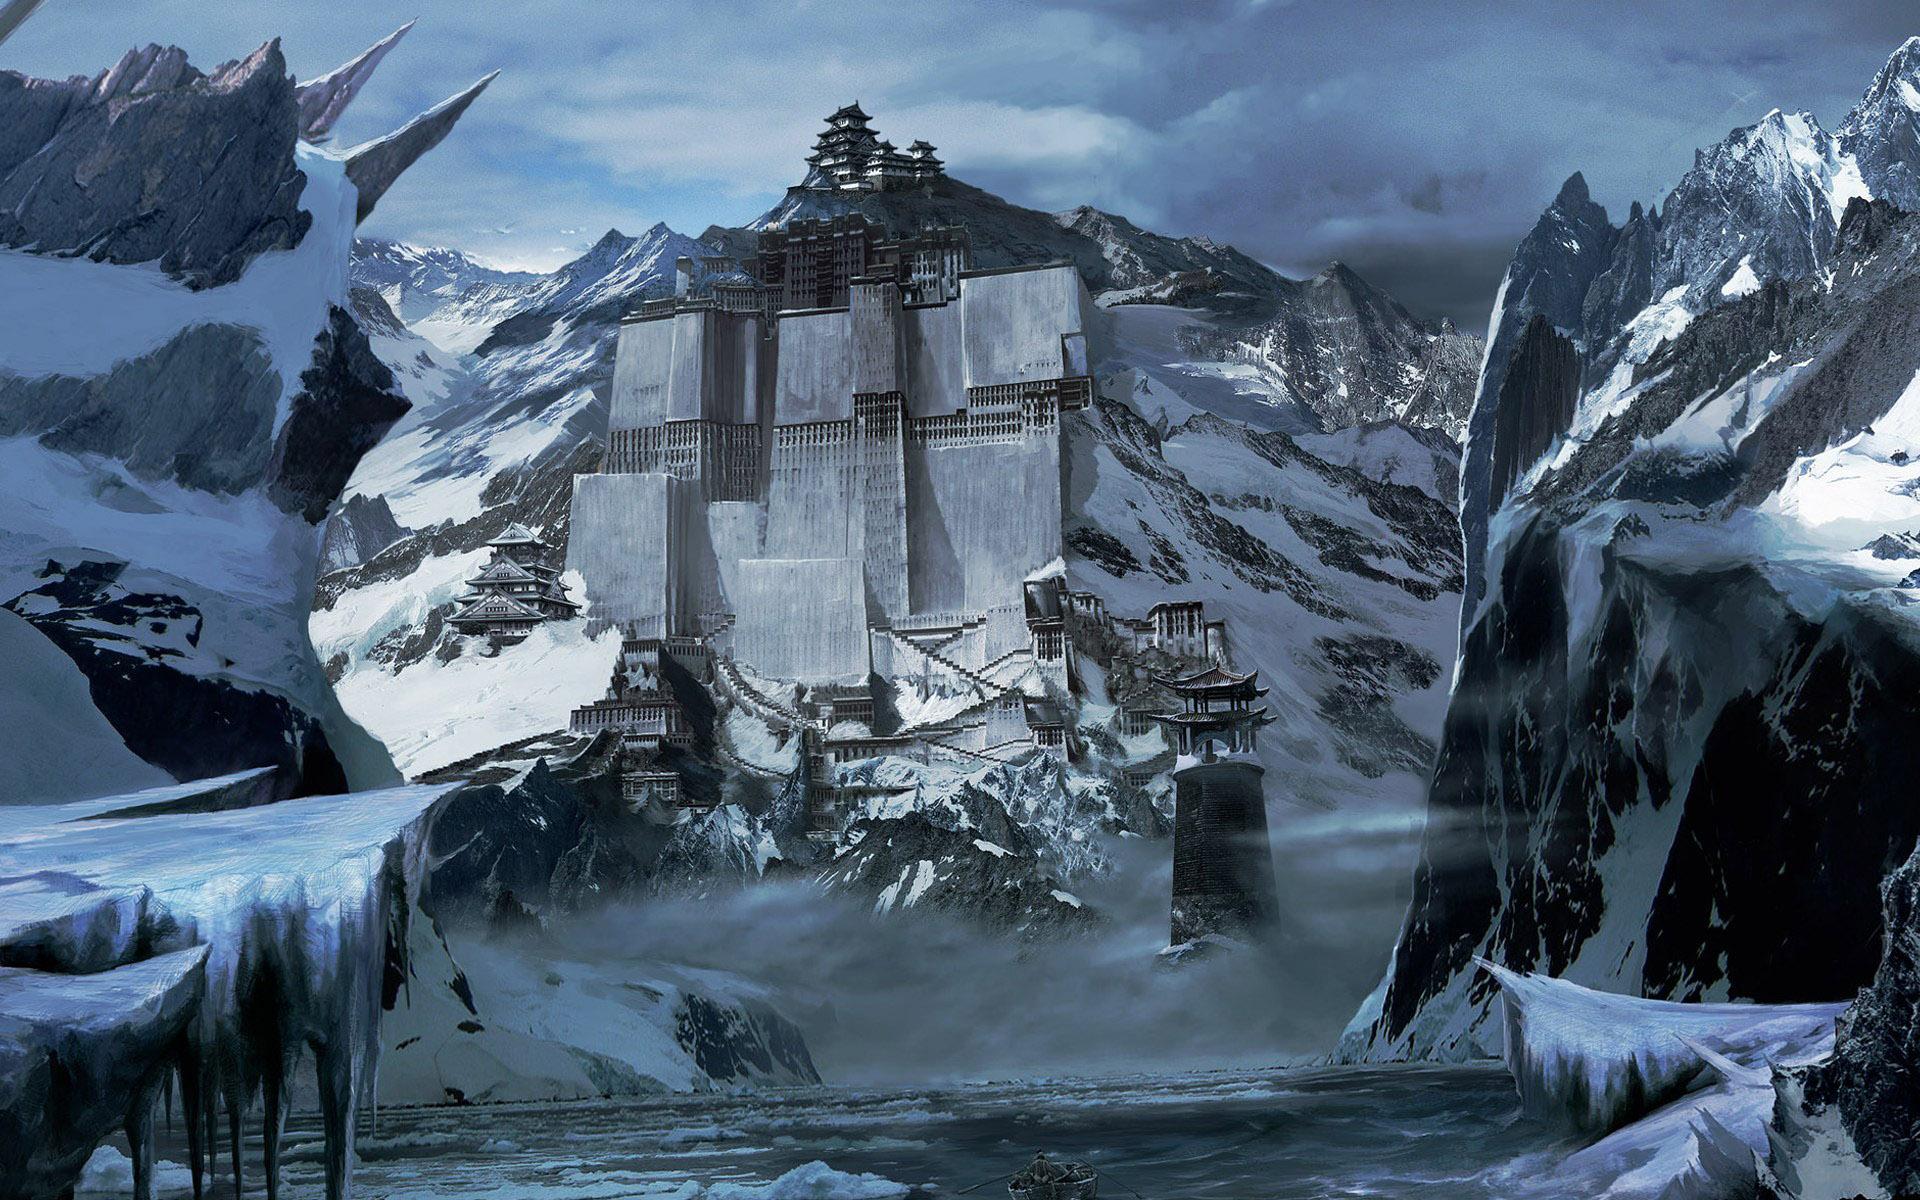 Beautiful Wallpaper Mountain Fantasy - architecture-fantasy-hallway-mountain-paper-photo-621125  Pic_45430.jpg